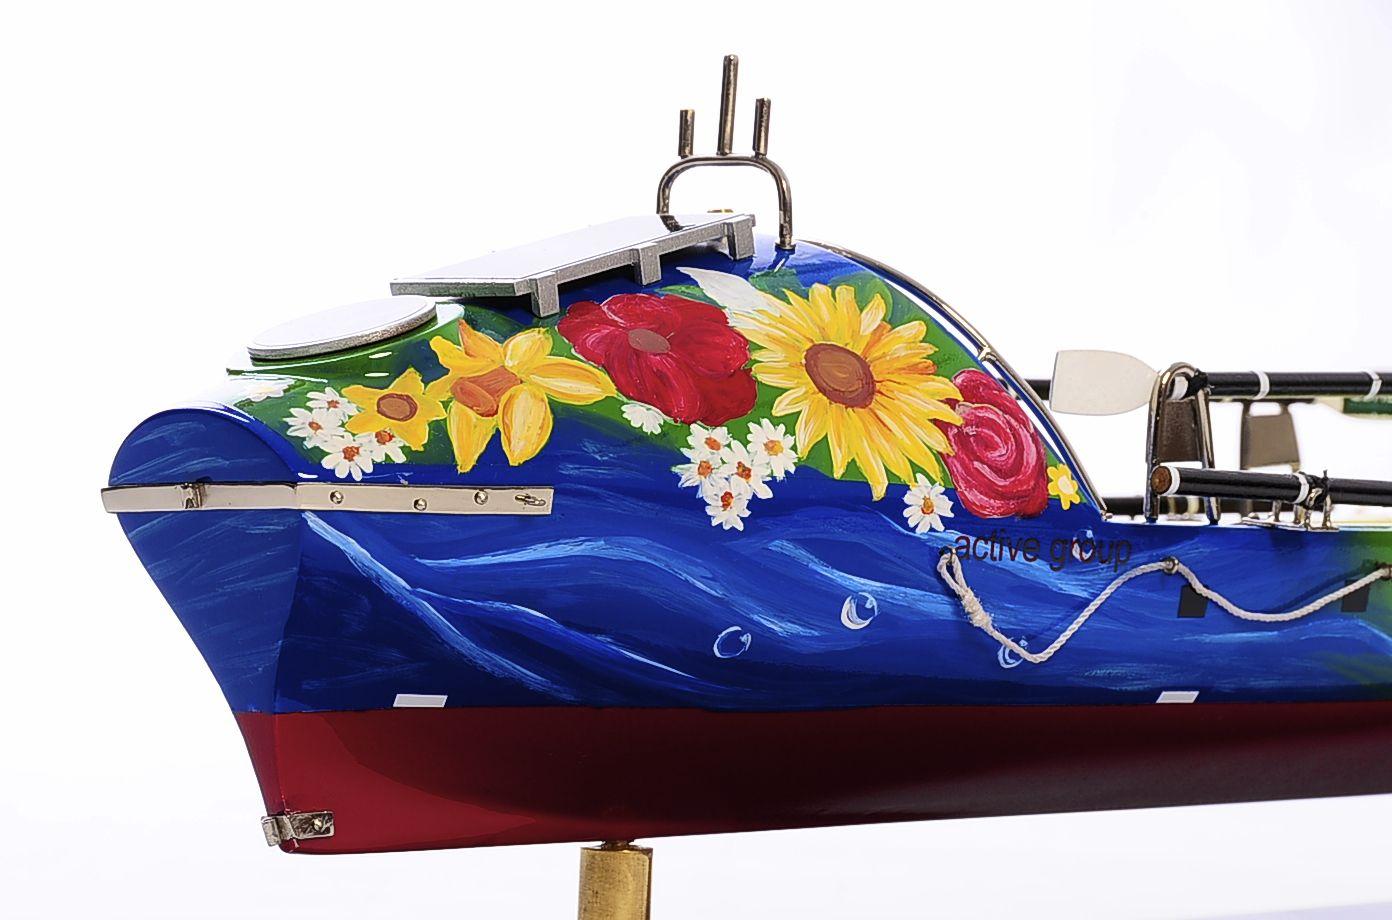 1389-8748-Ocean-Rowing-Boat-Model